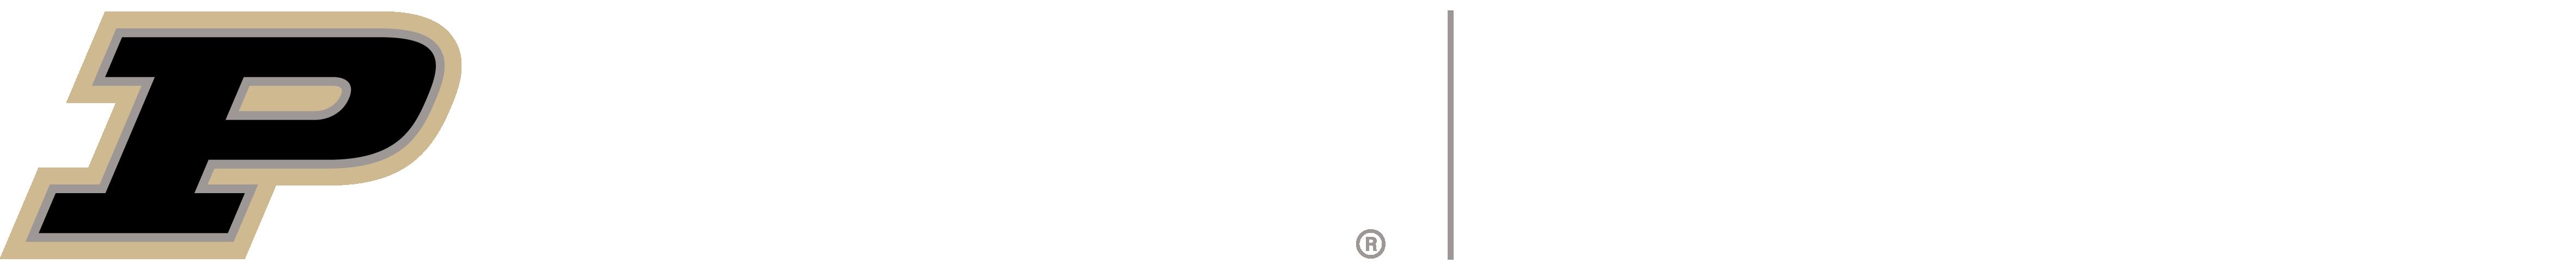 purdue ece co-brand